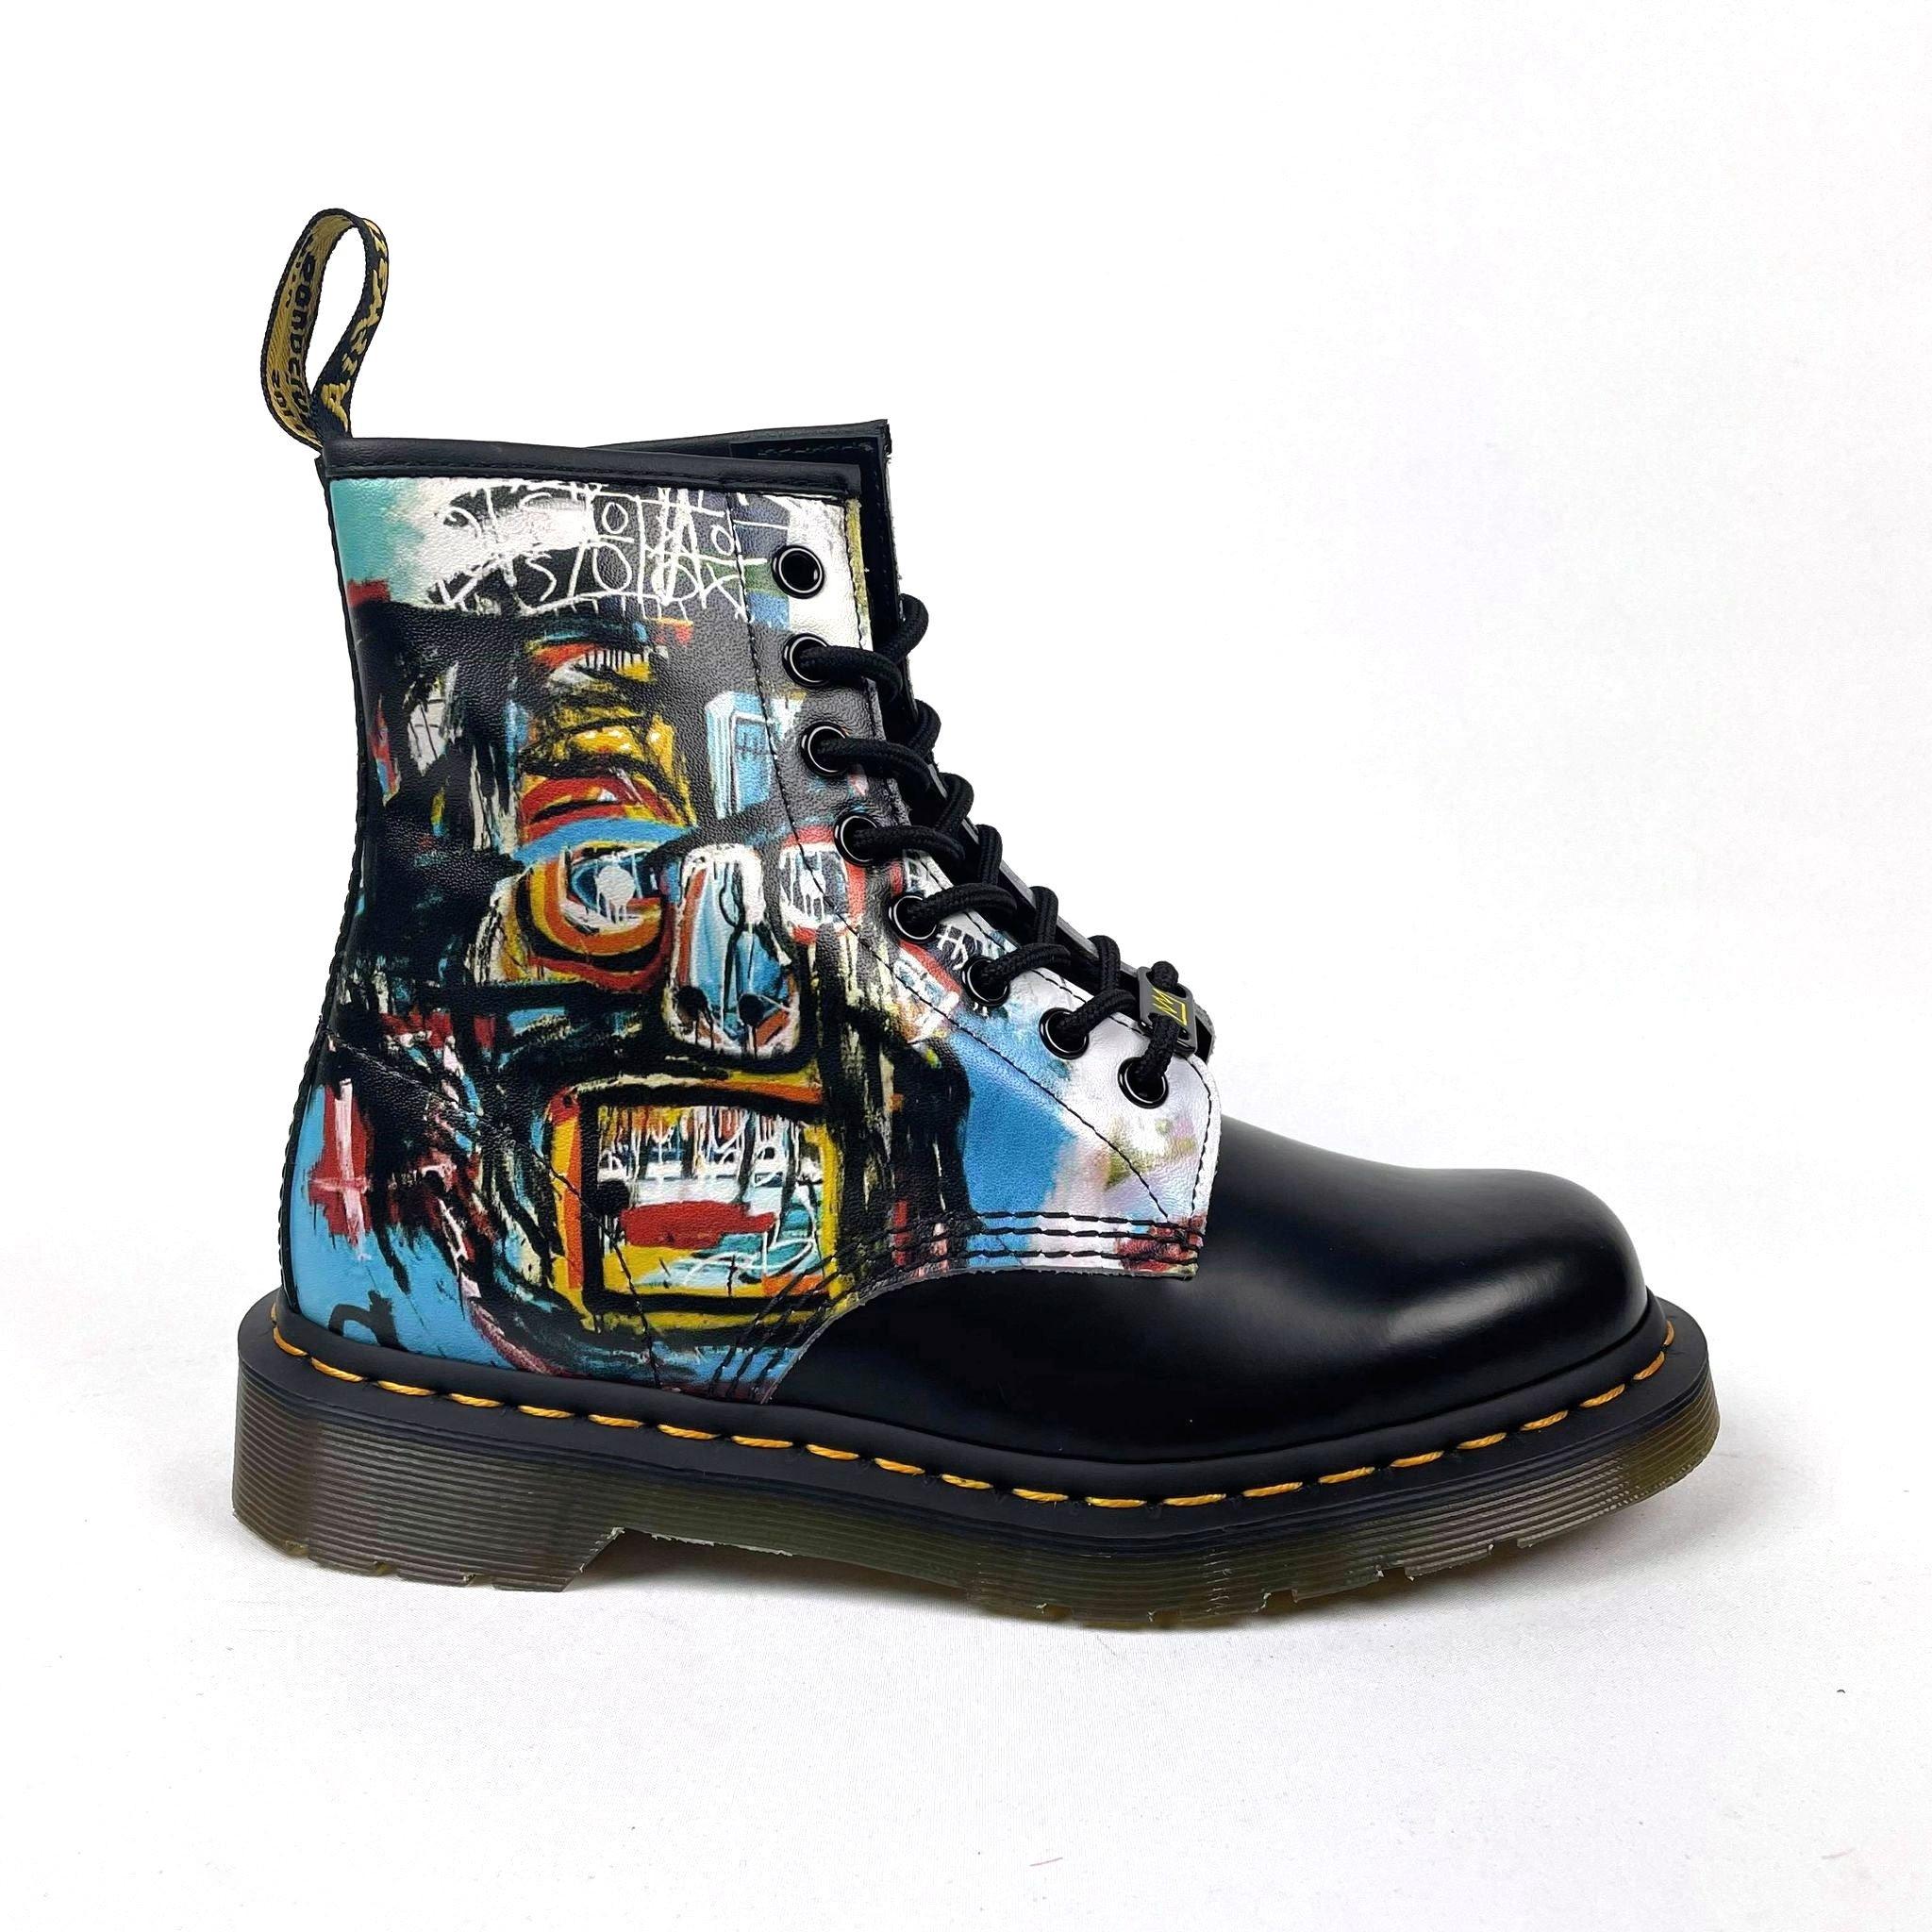 Dr Martens 1460 Basquiat II - Black/Multi